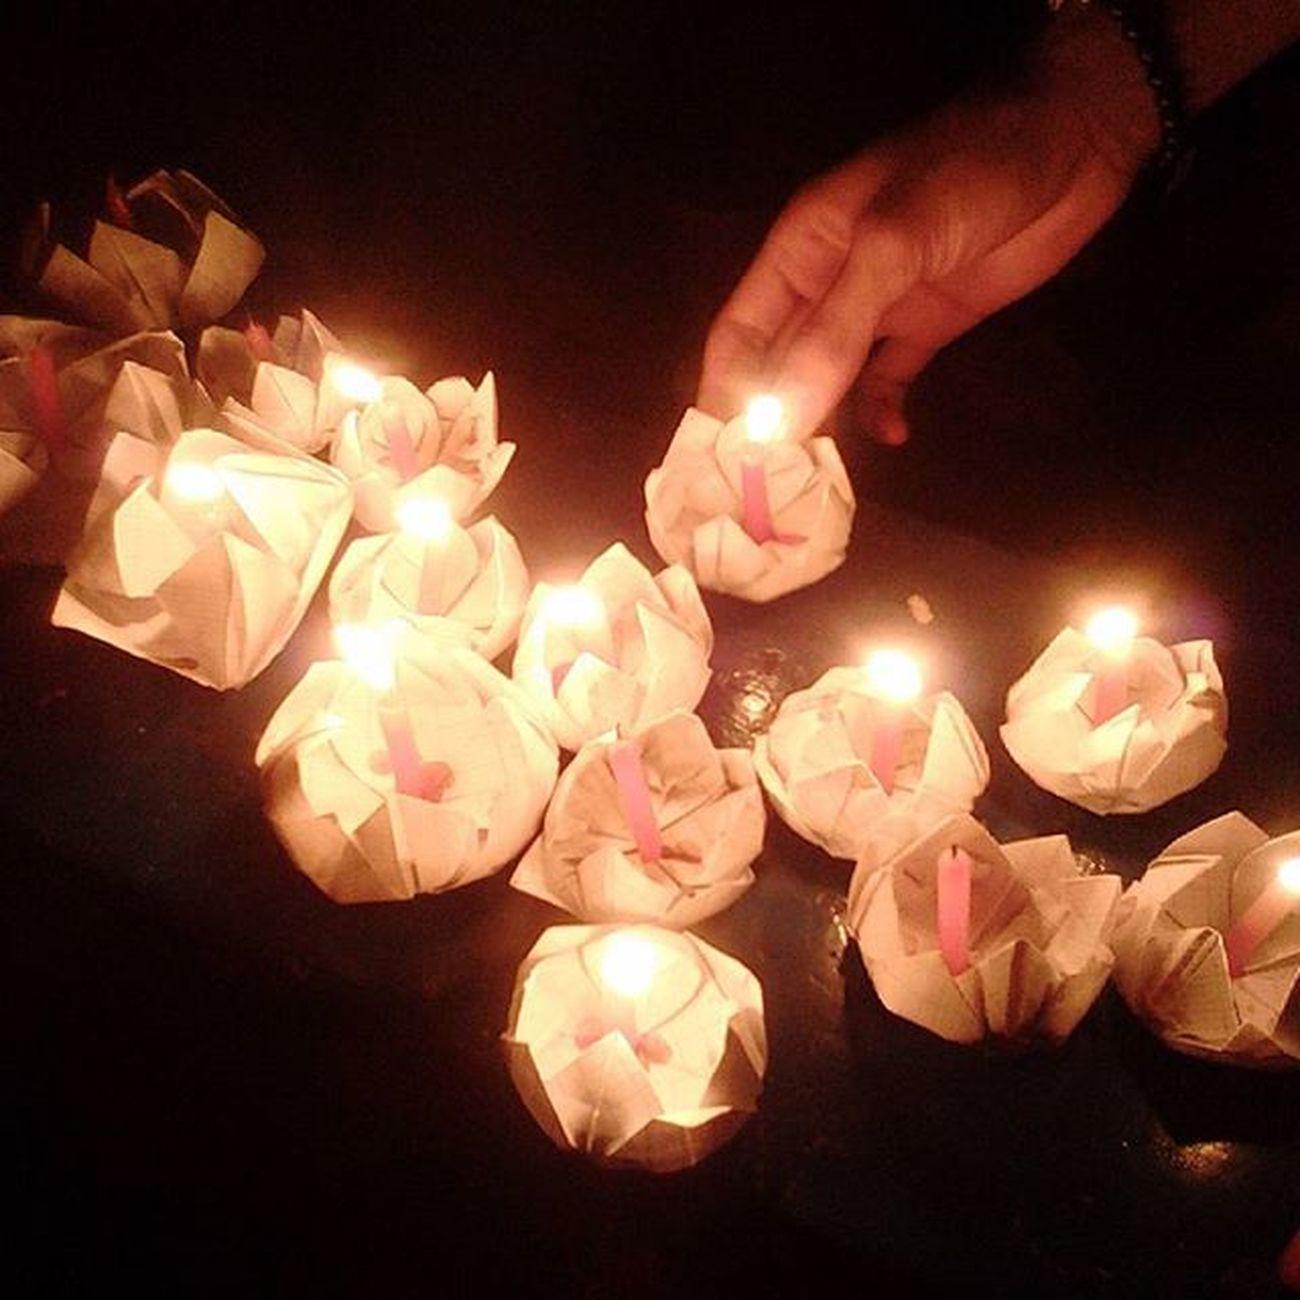 Lanterns Happymoonfestival Mướn đò đi thả đèn mà thả cái nào tắt cái đó. Bực :)) Lanternsonthelake Trungthu candles lights papers VietNamfestival night instagood instalike instafollow instapic instaphoto instalights